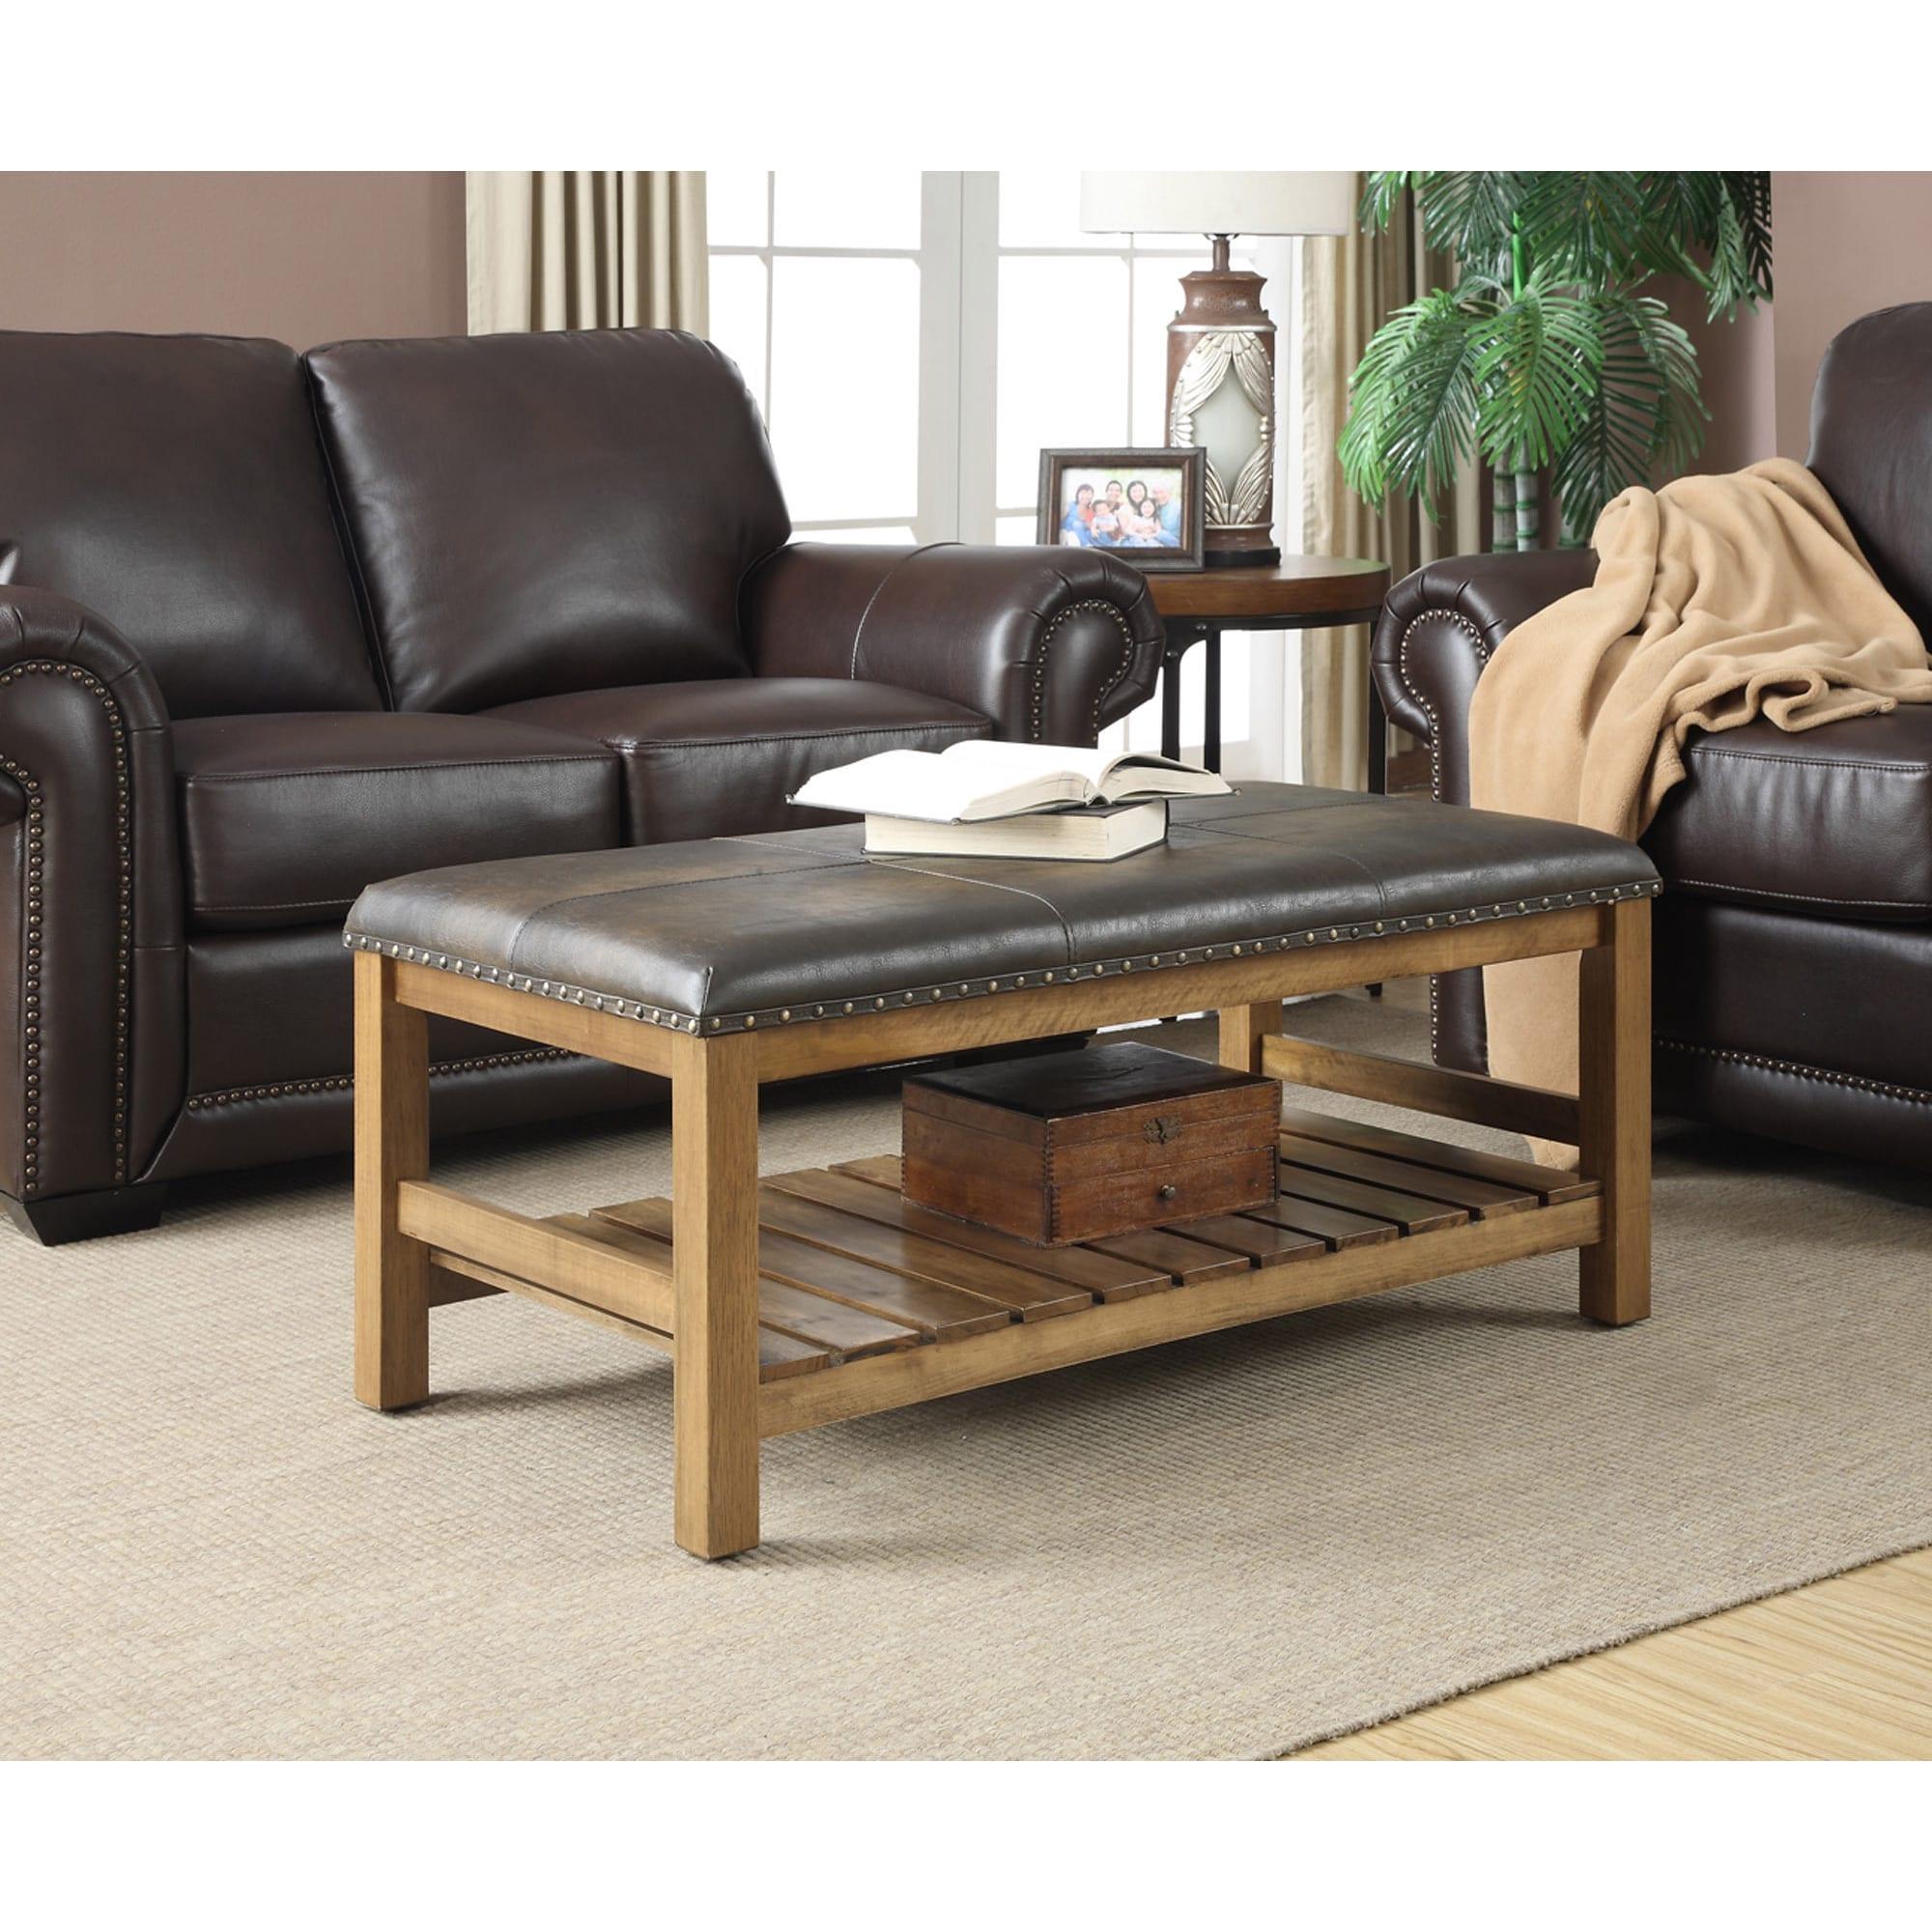 Convenience Concepts Designs4Comfort Tucson Ottoman Bench...